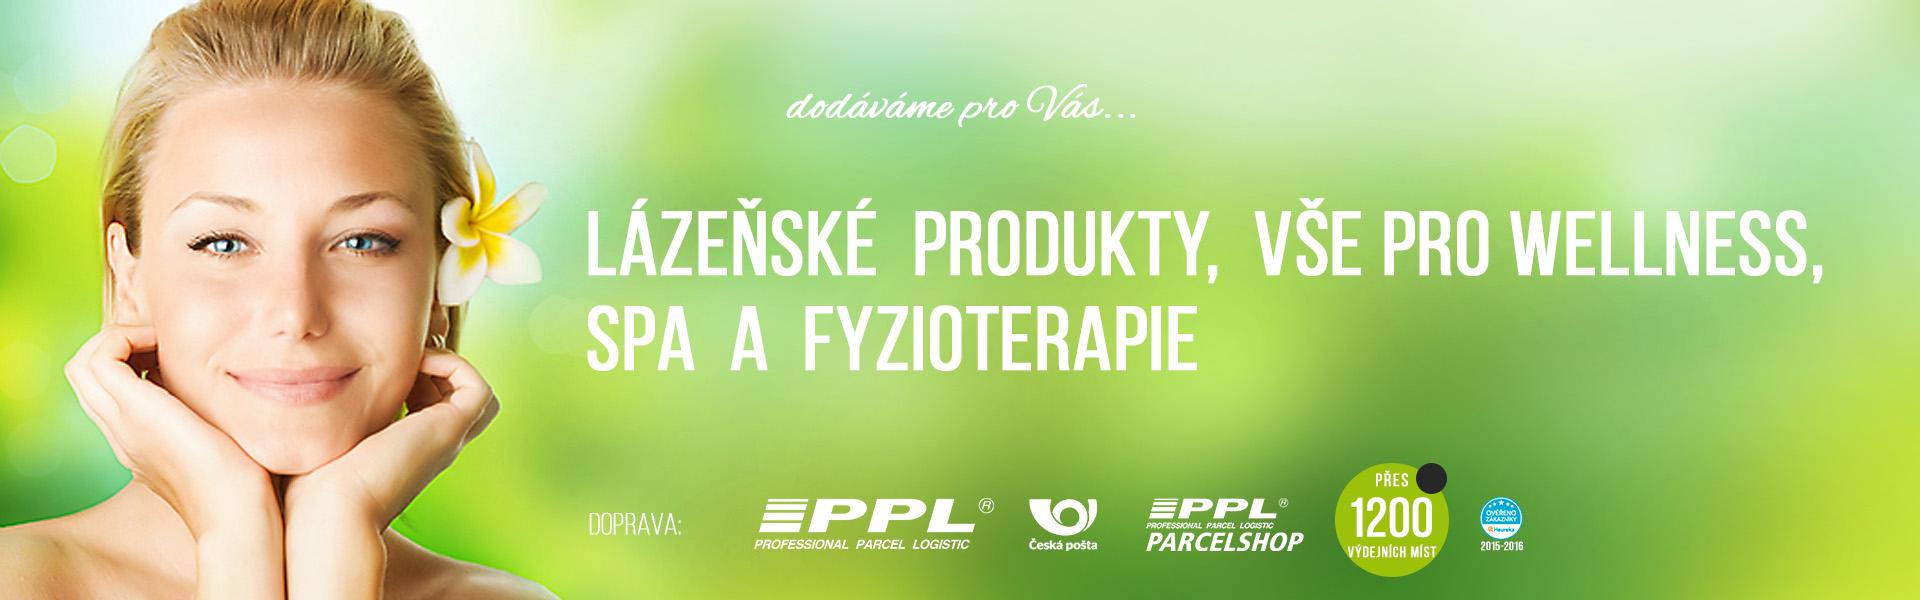 Profirelax.cz